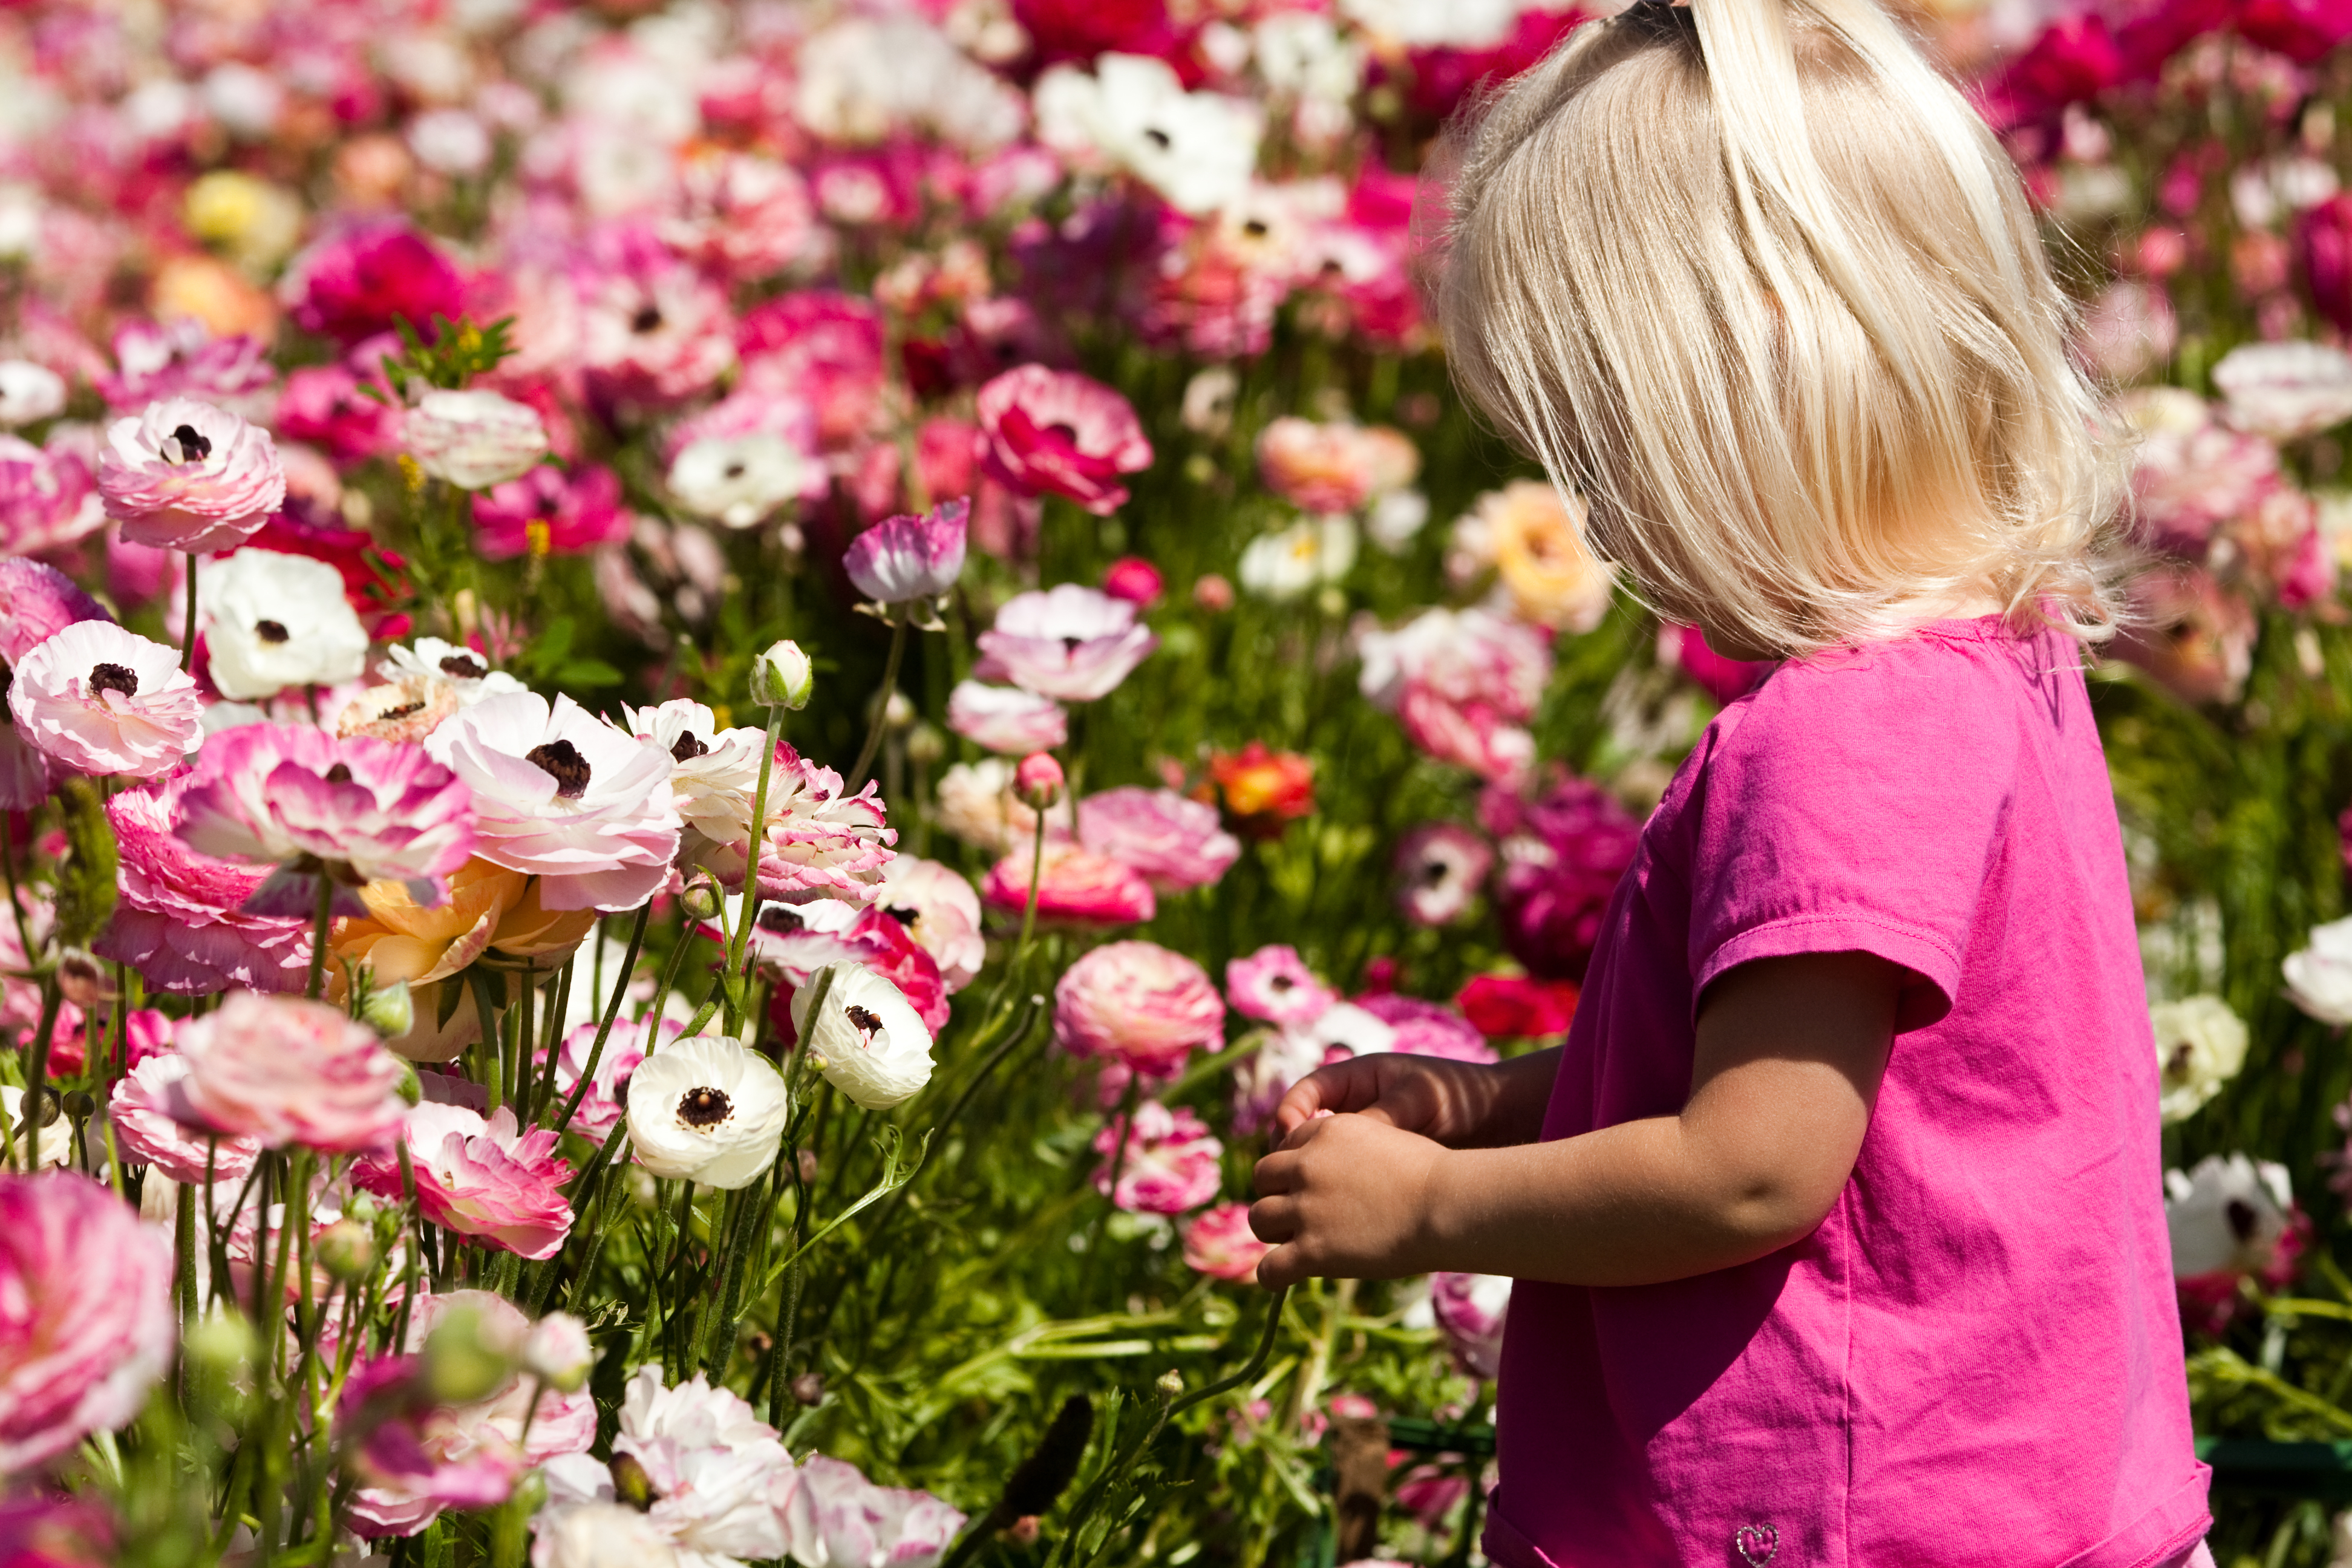 Spring Has Sprung at These 5 Botanical Gardens